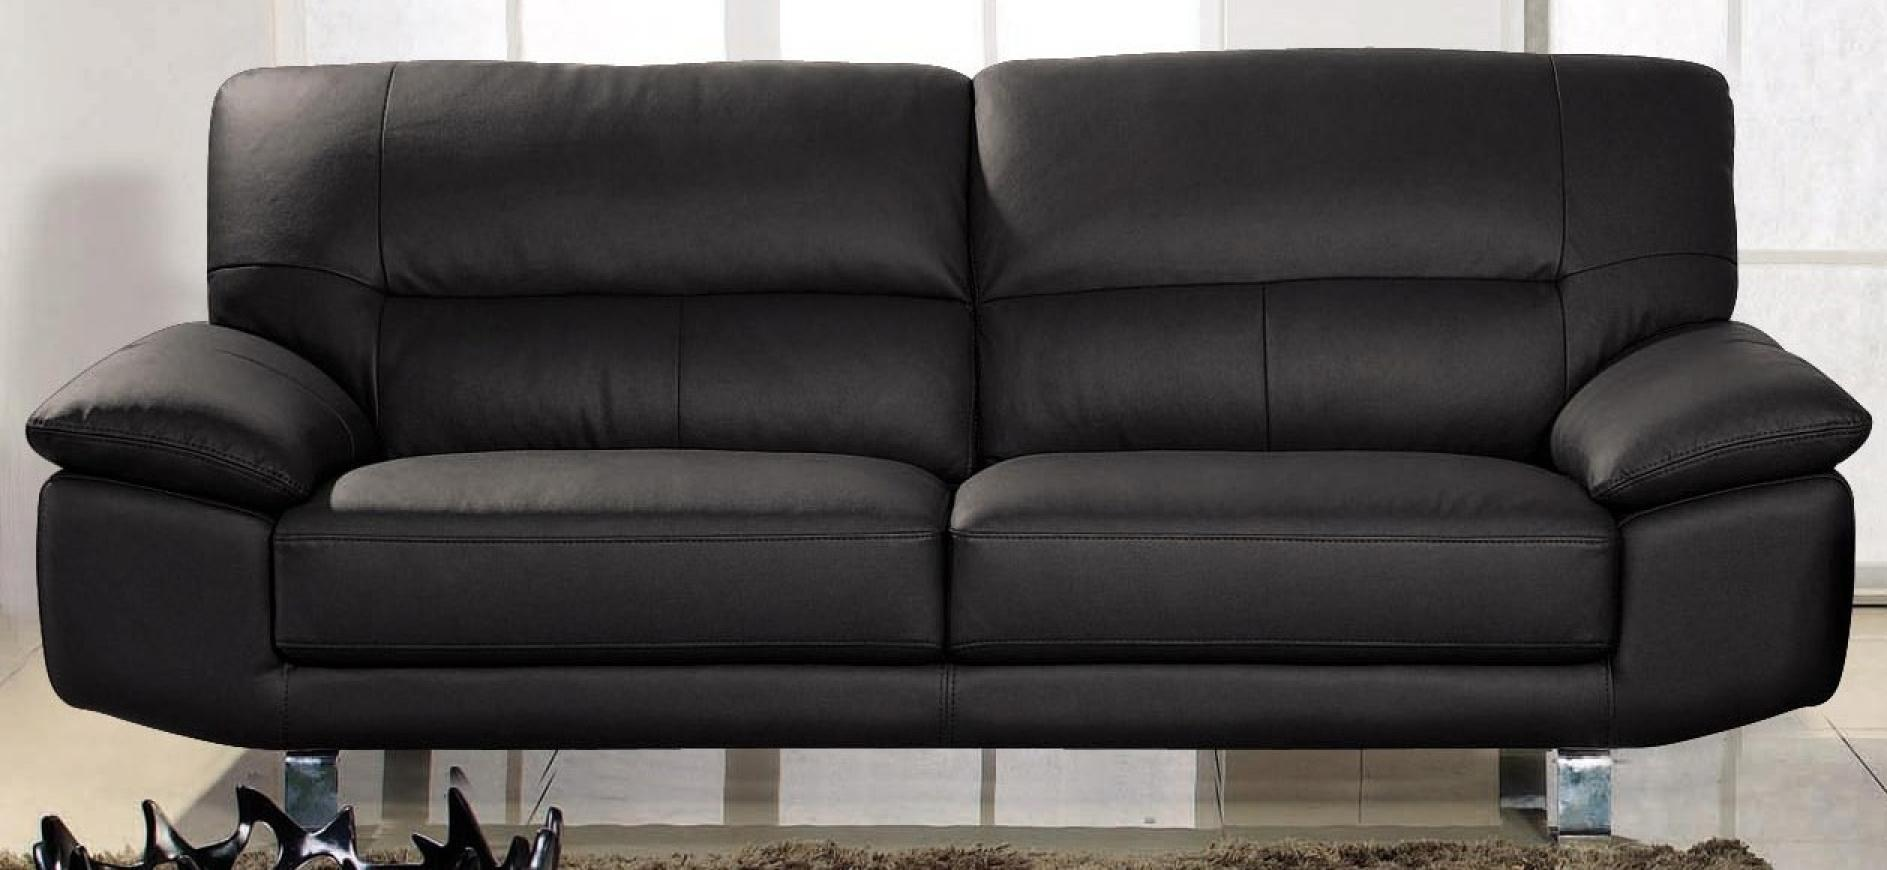 photos canap cuir noir. Black Bedroom Furniture Sets. Home Design Ideas